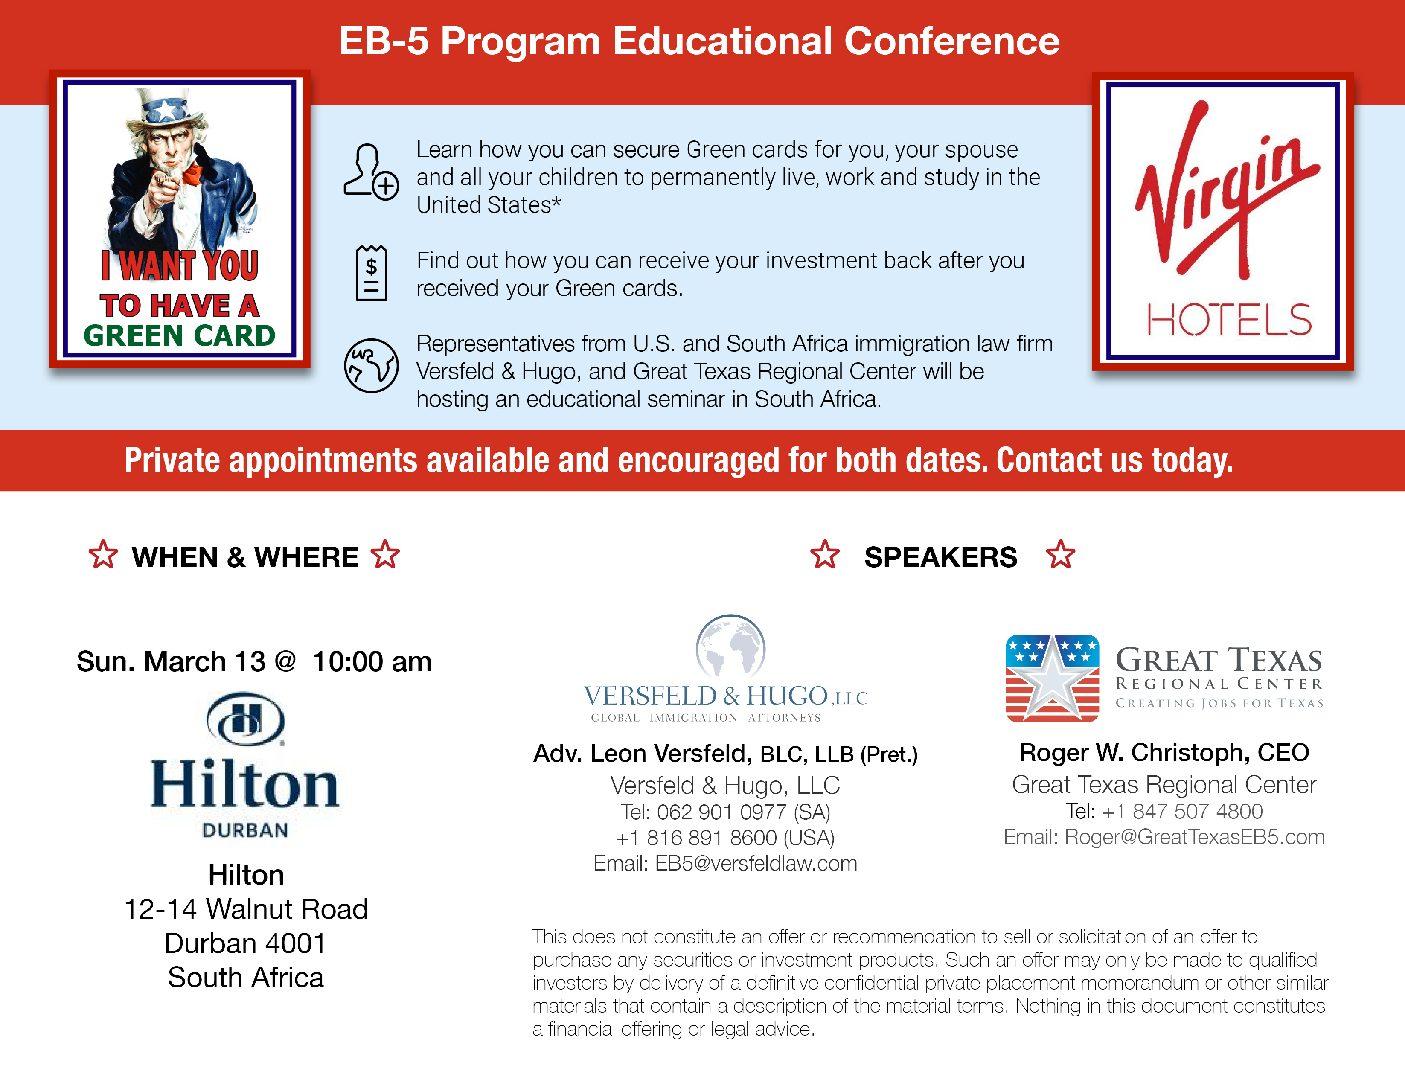 EB-5 Program Educational Conference